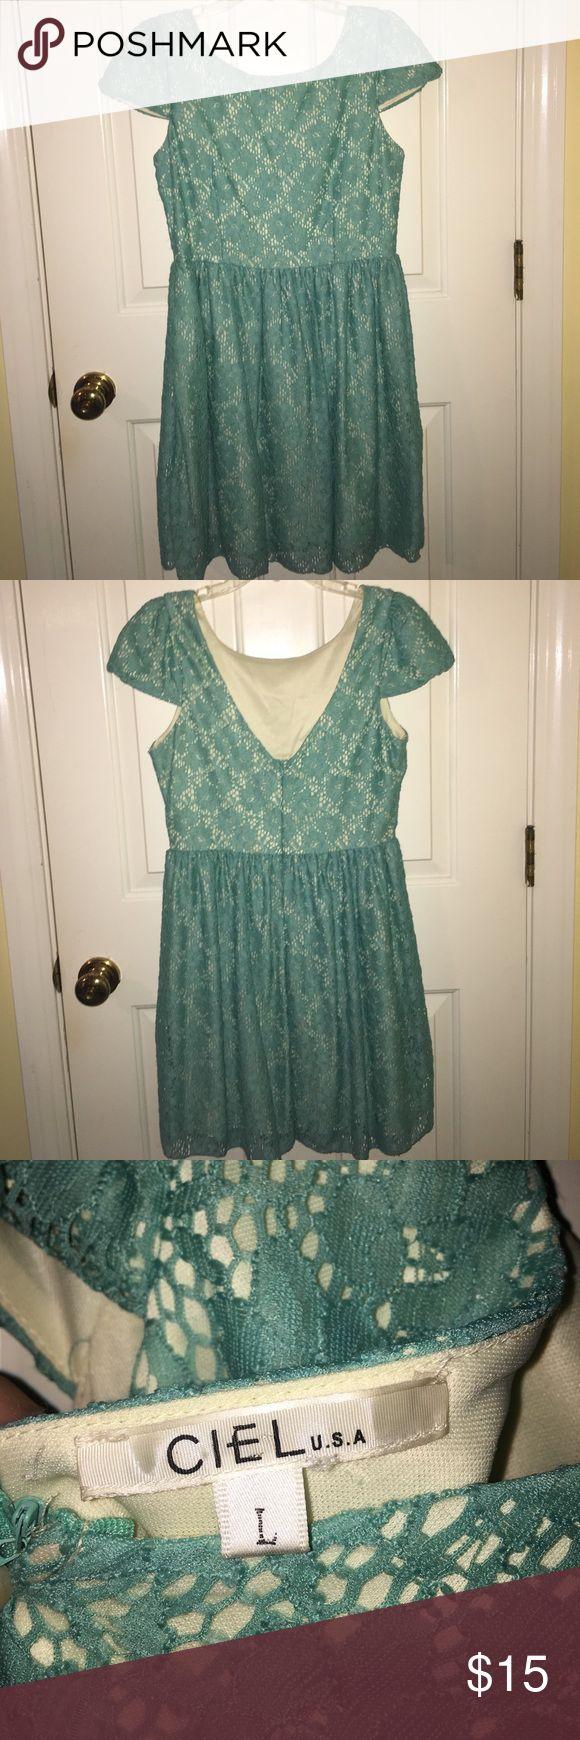 CIEL USA Dress Light turquoise lace dress with cream slip. Lower V back. CIEL USA Dresses Mini